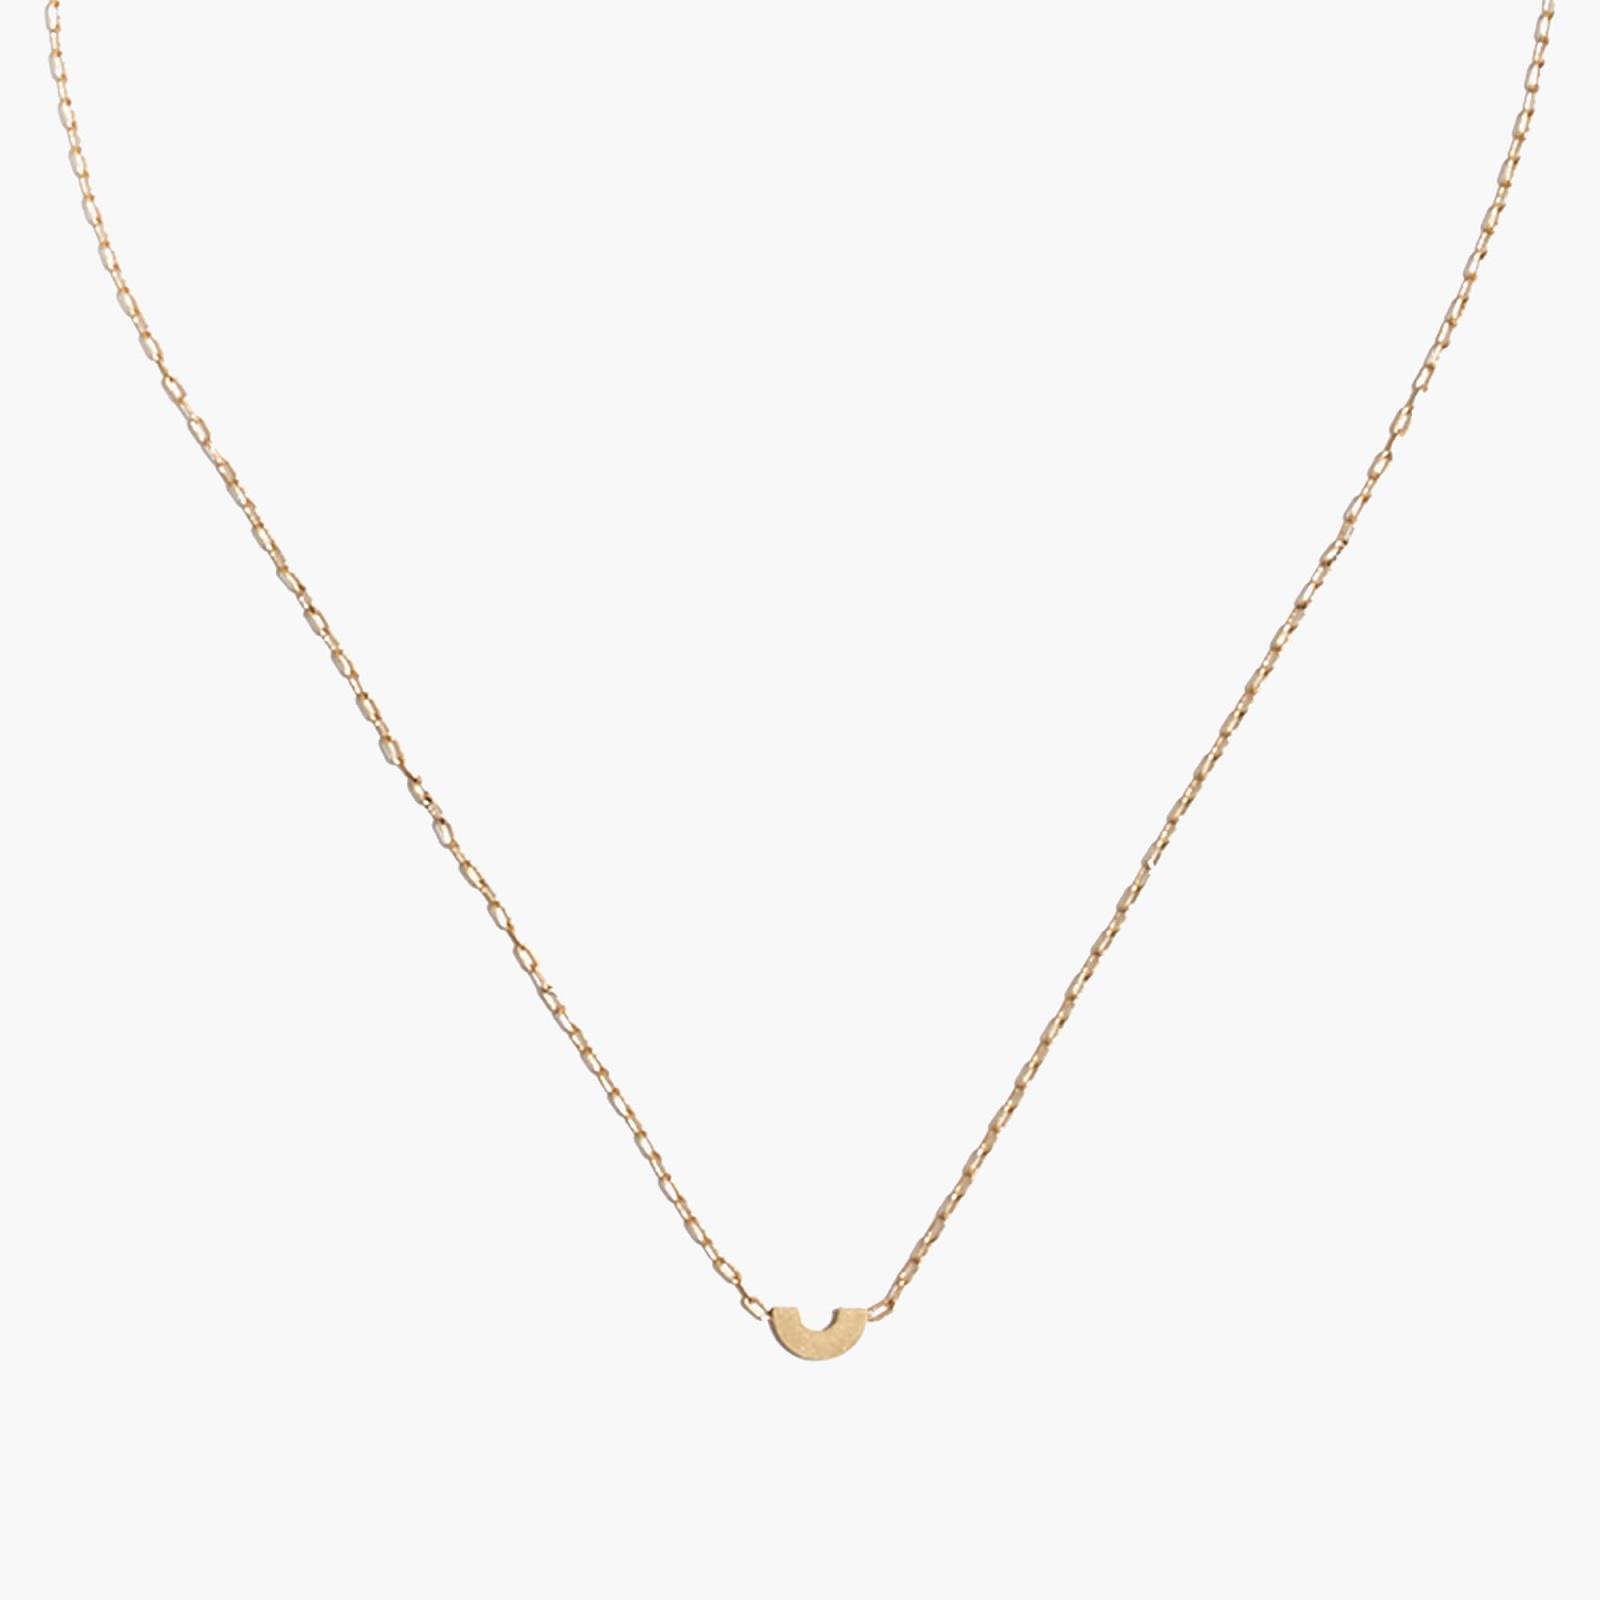 madewell charm necklace.jpeg